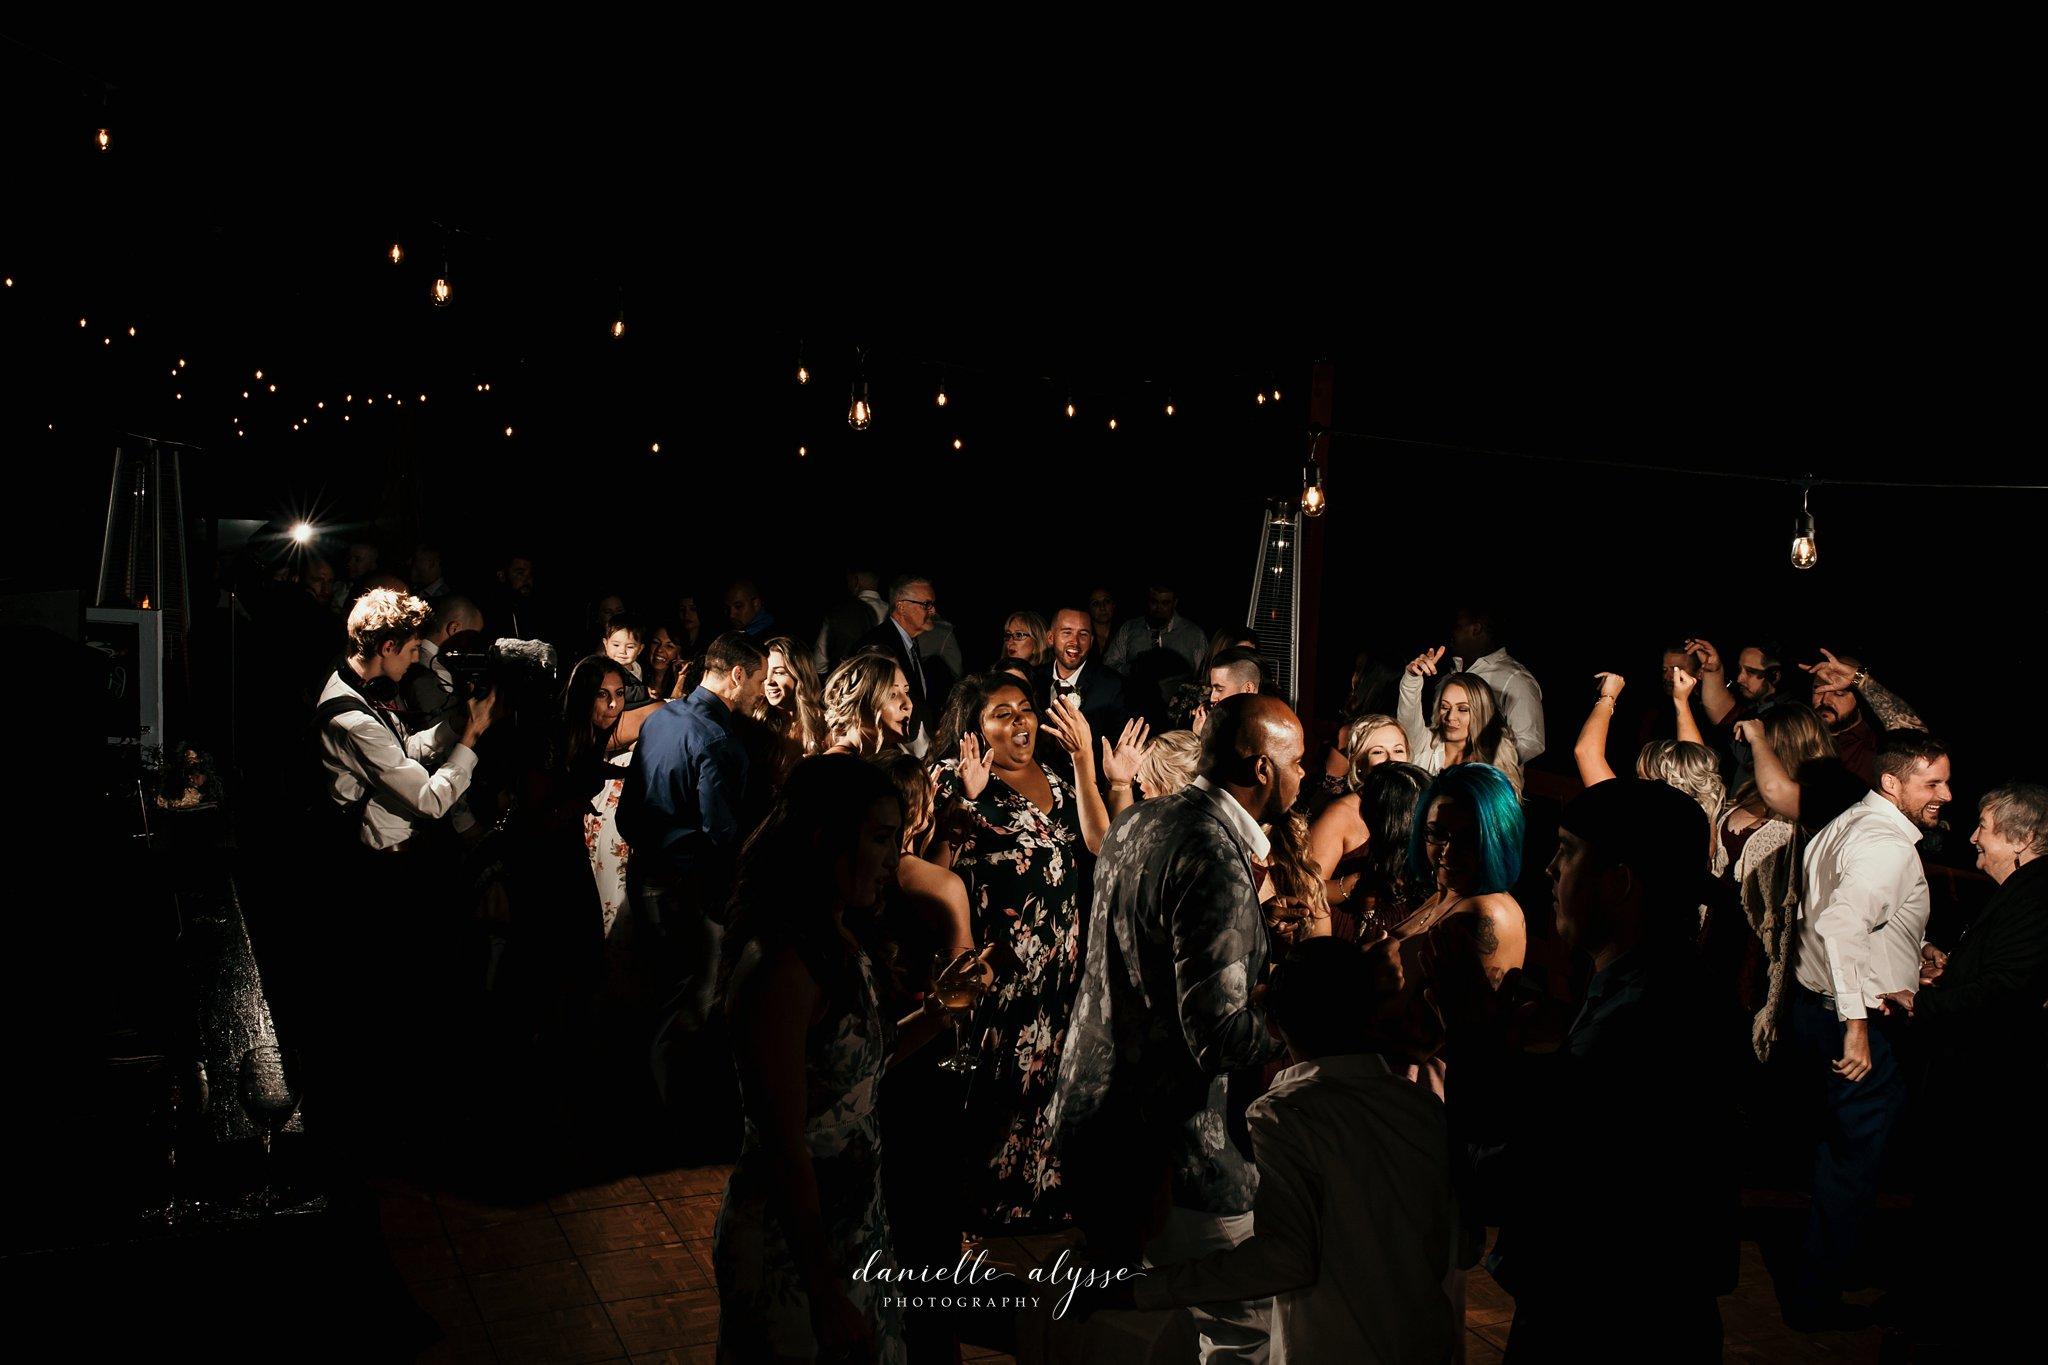 180831_wedding_stephanie_heavenly_south_lake_tahoe_danielle_alysse_photography_destination_blog_1221_WEB.jpg